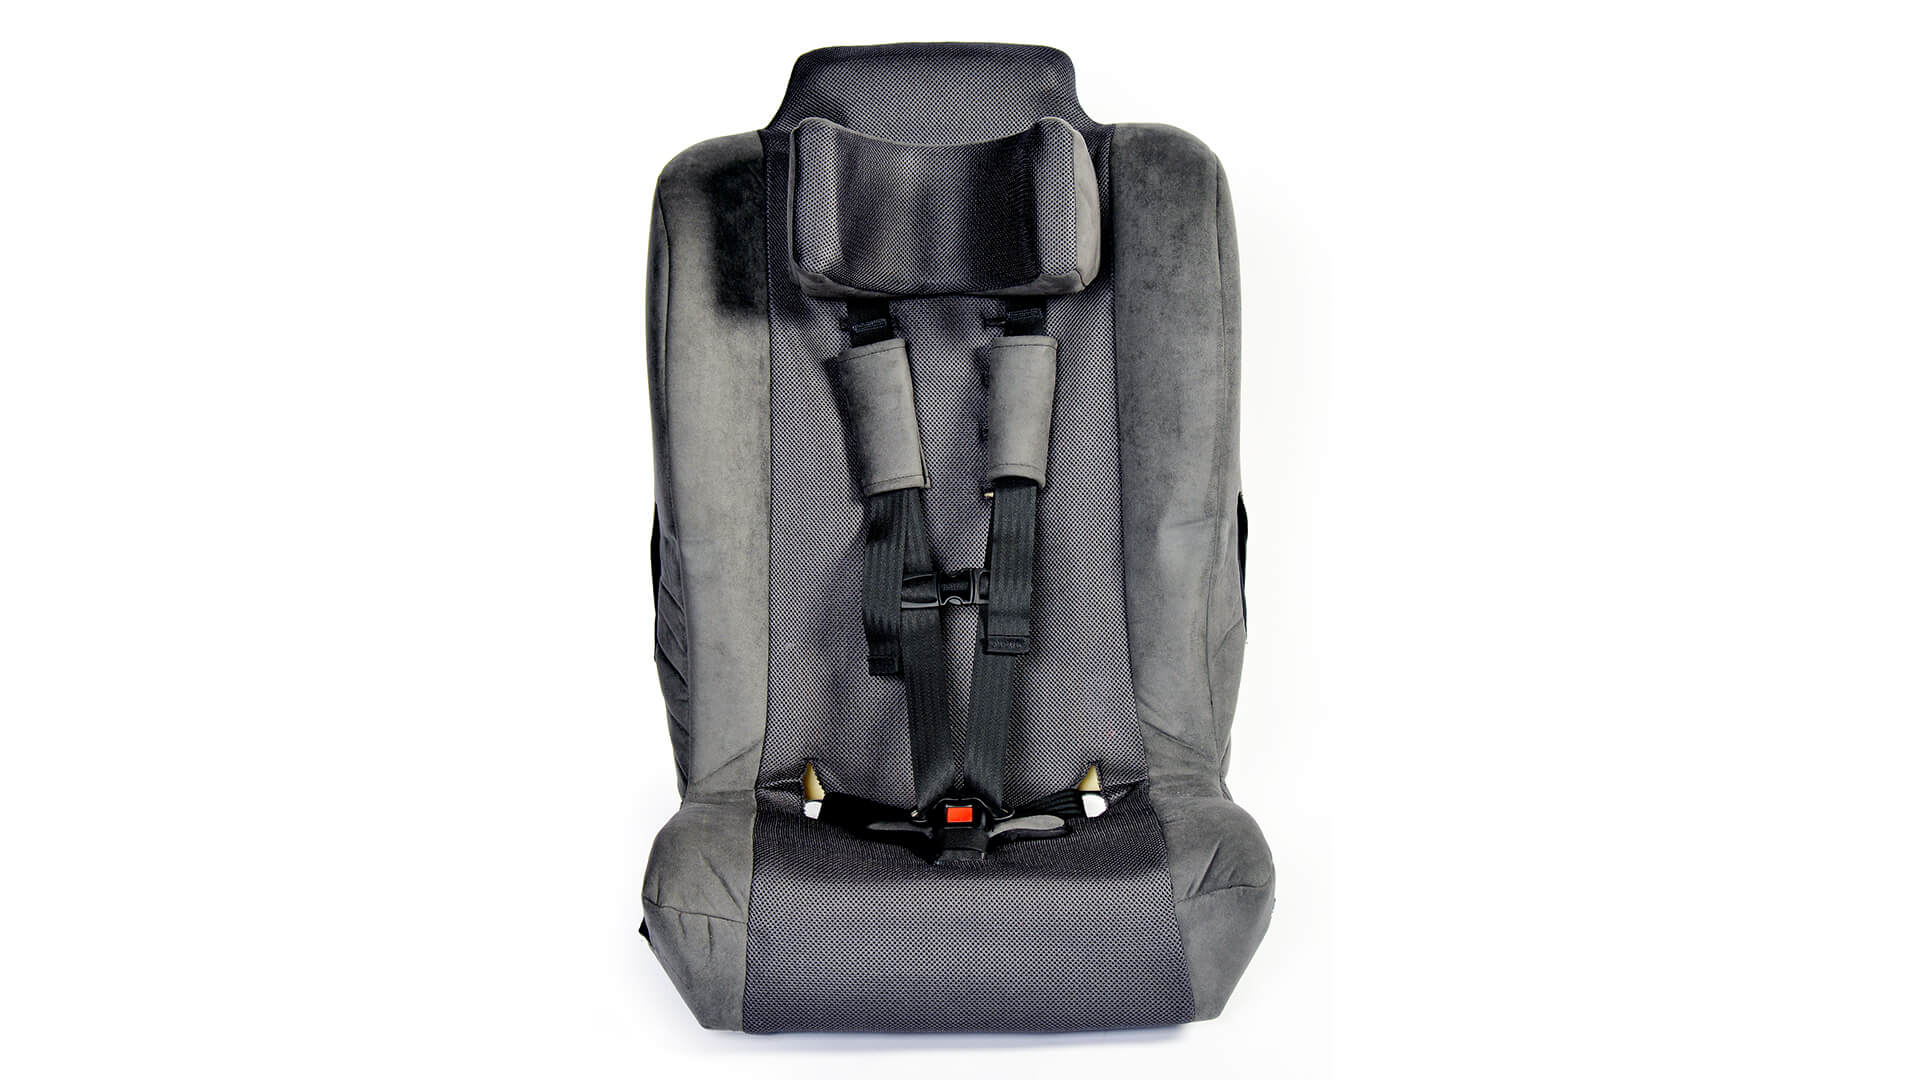 Wondrous Spirit Car Seat Creativecarmelina Interior Chair Design Creativecarmelinacom